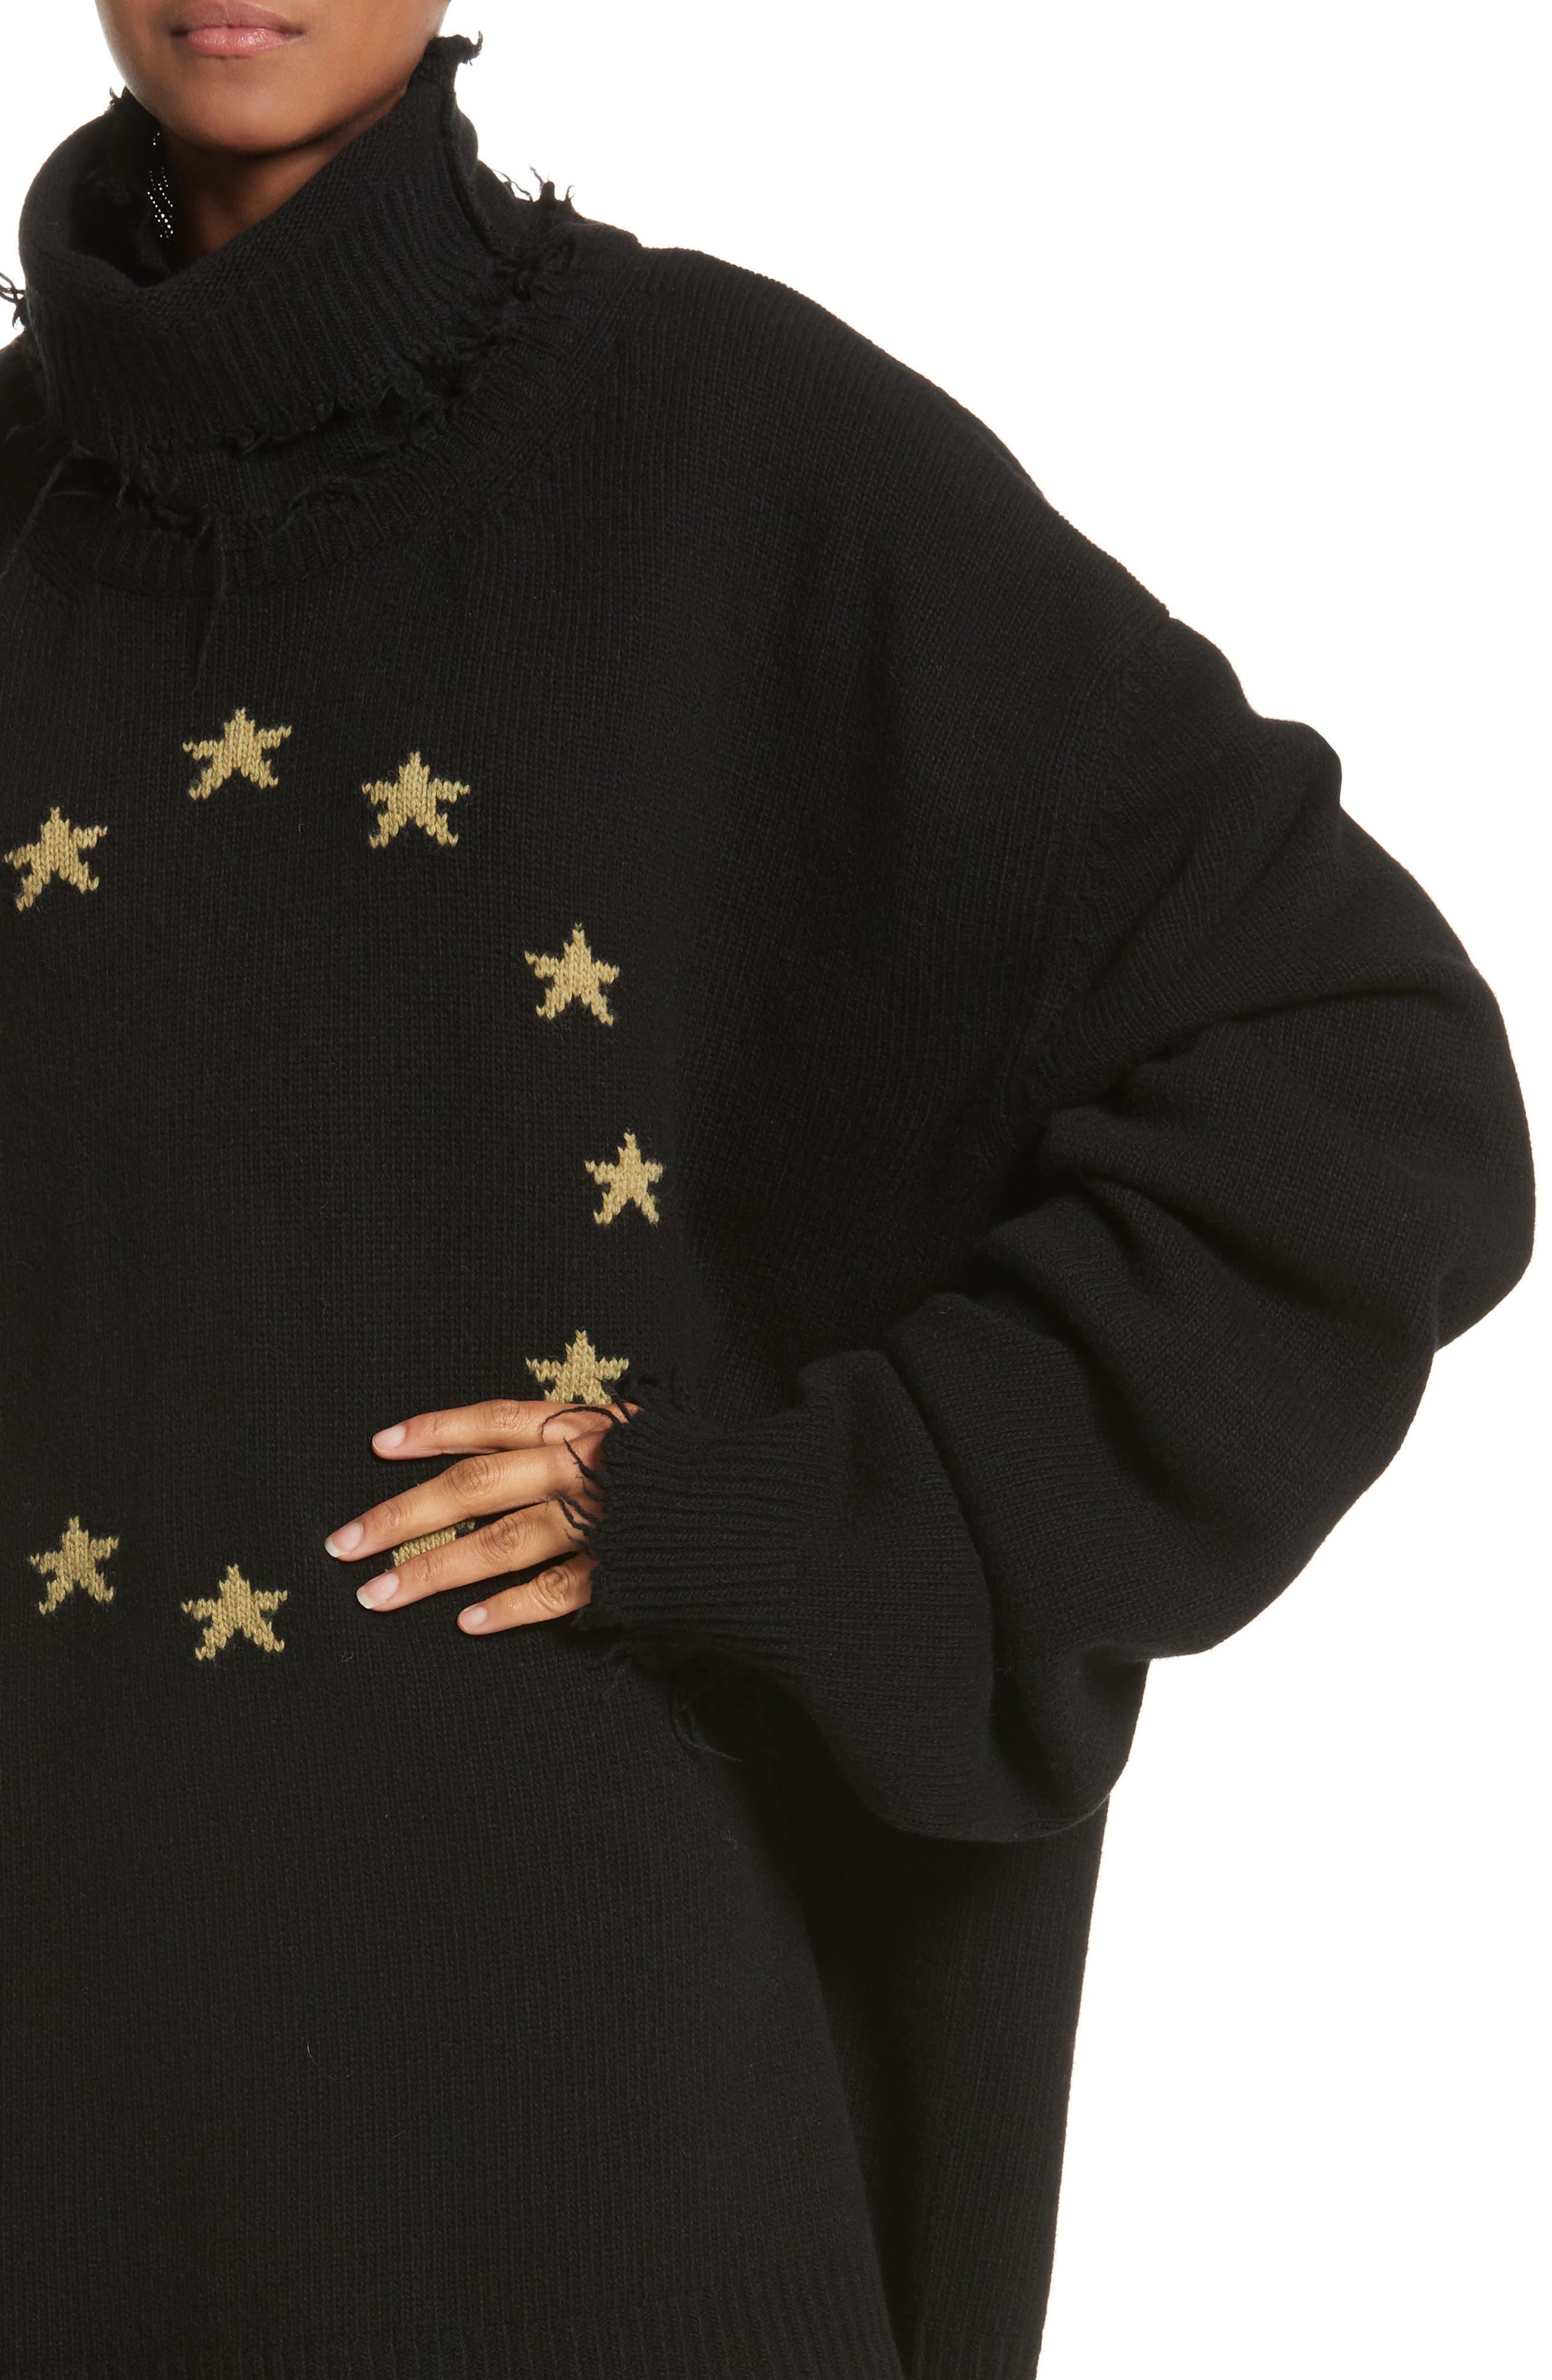 Star Turtleneck Sweater,                             Alternate thumbnail 4, color,                             001